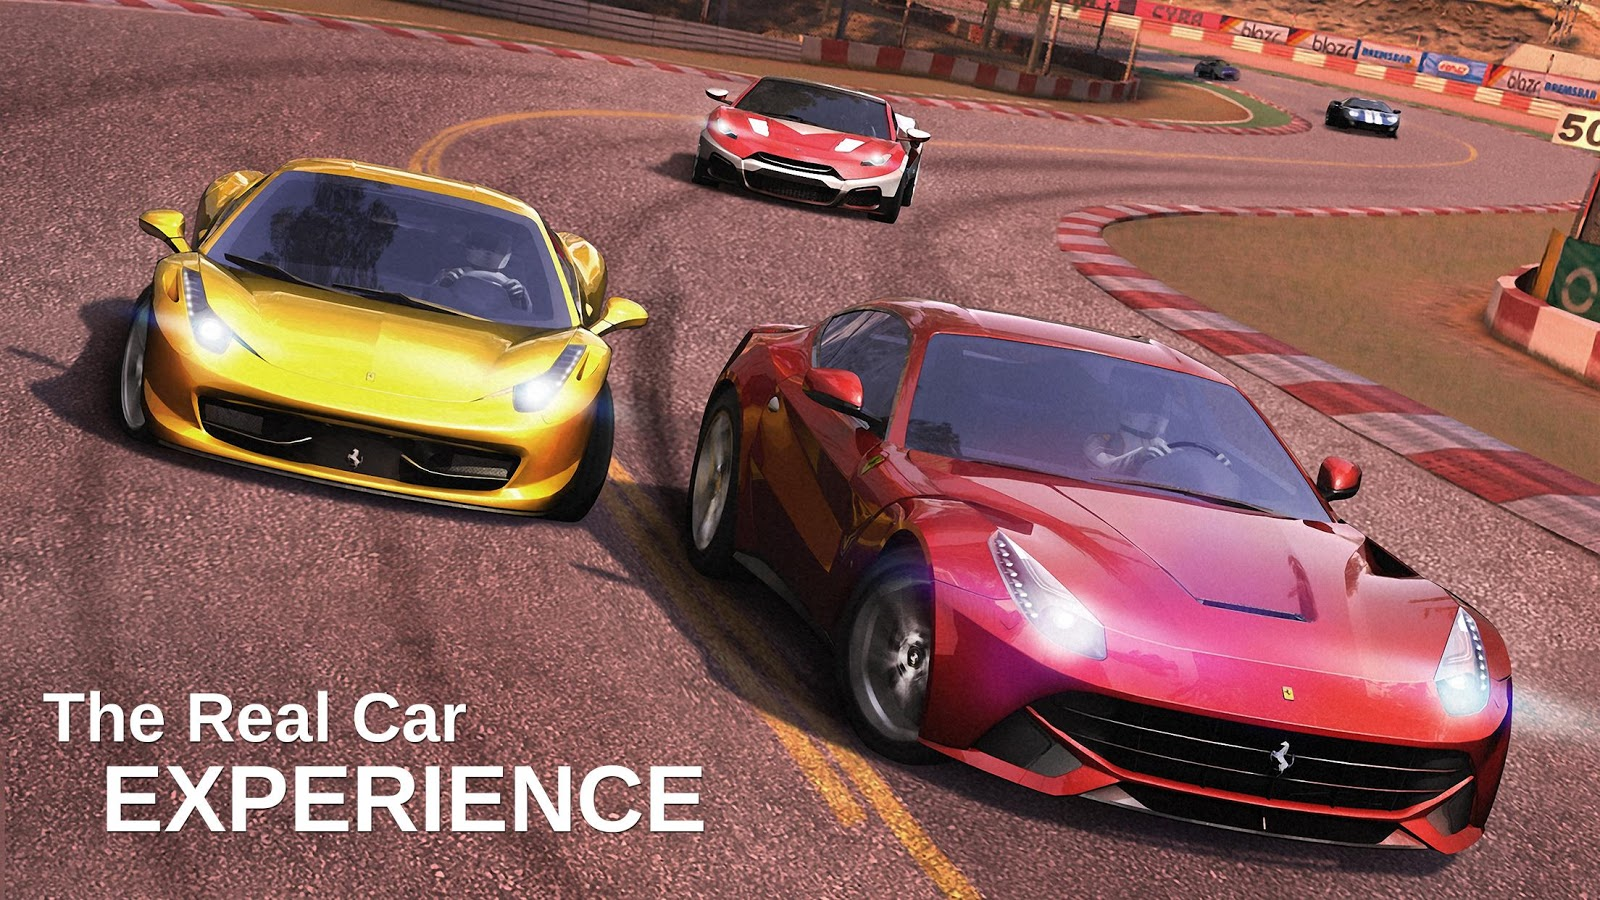 Gt racing 2 the real car exp 1 5 8e screenshot 1